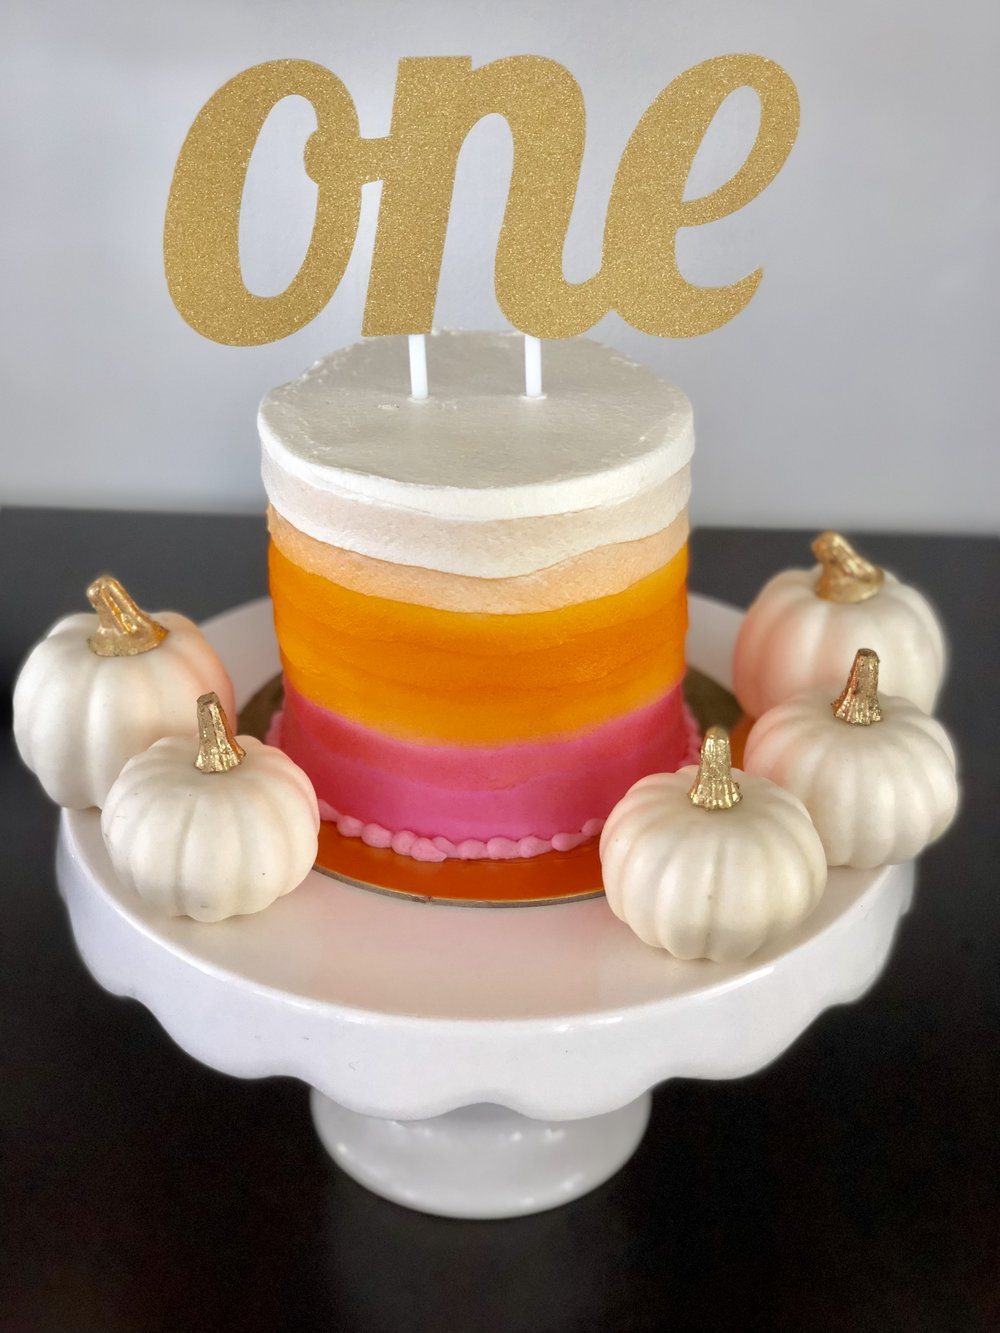 ombre pink and orange smash cake.jpg